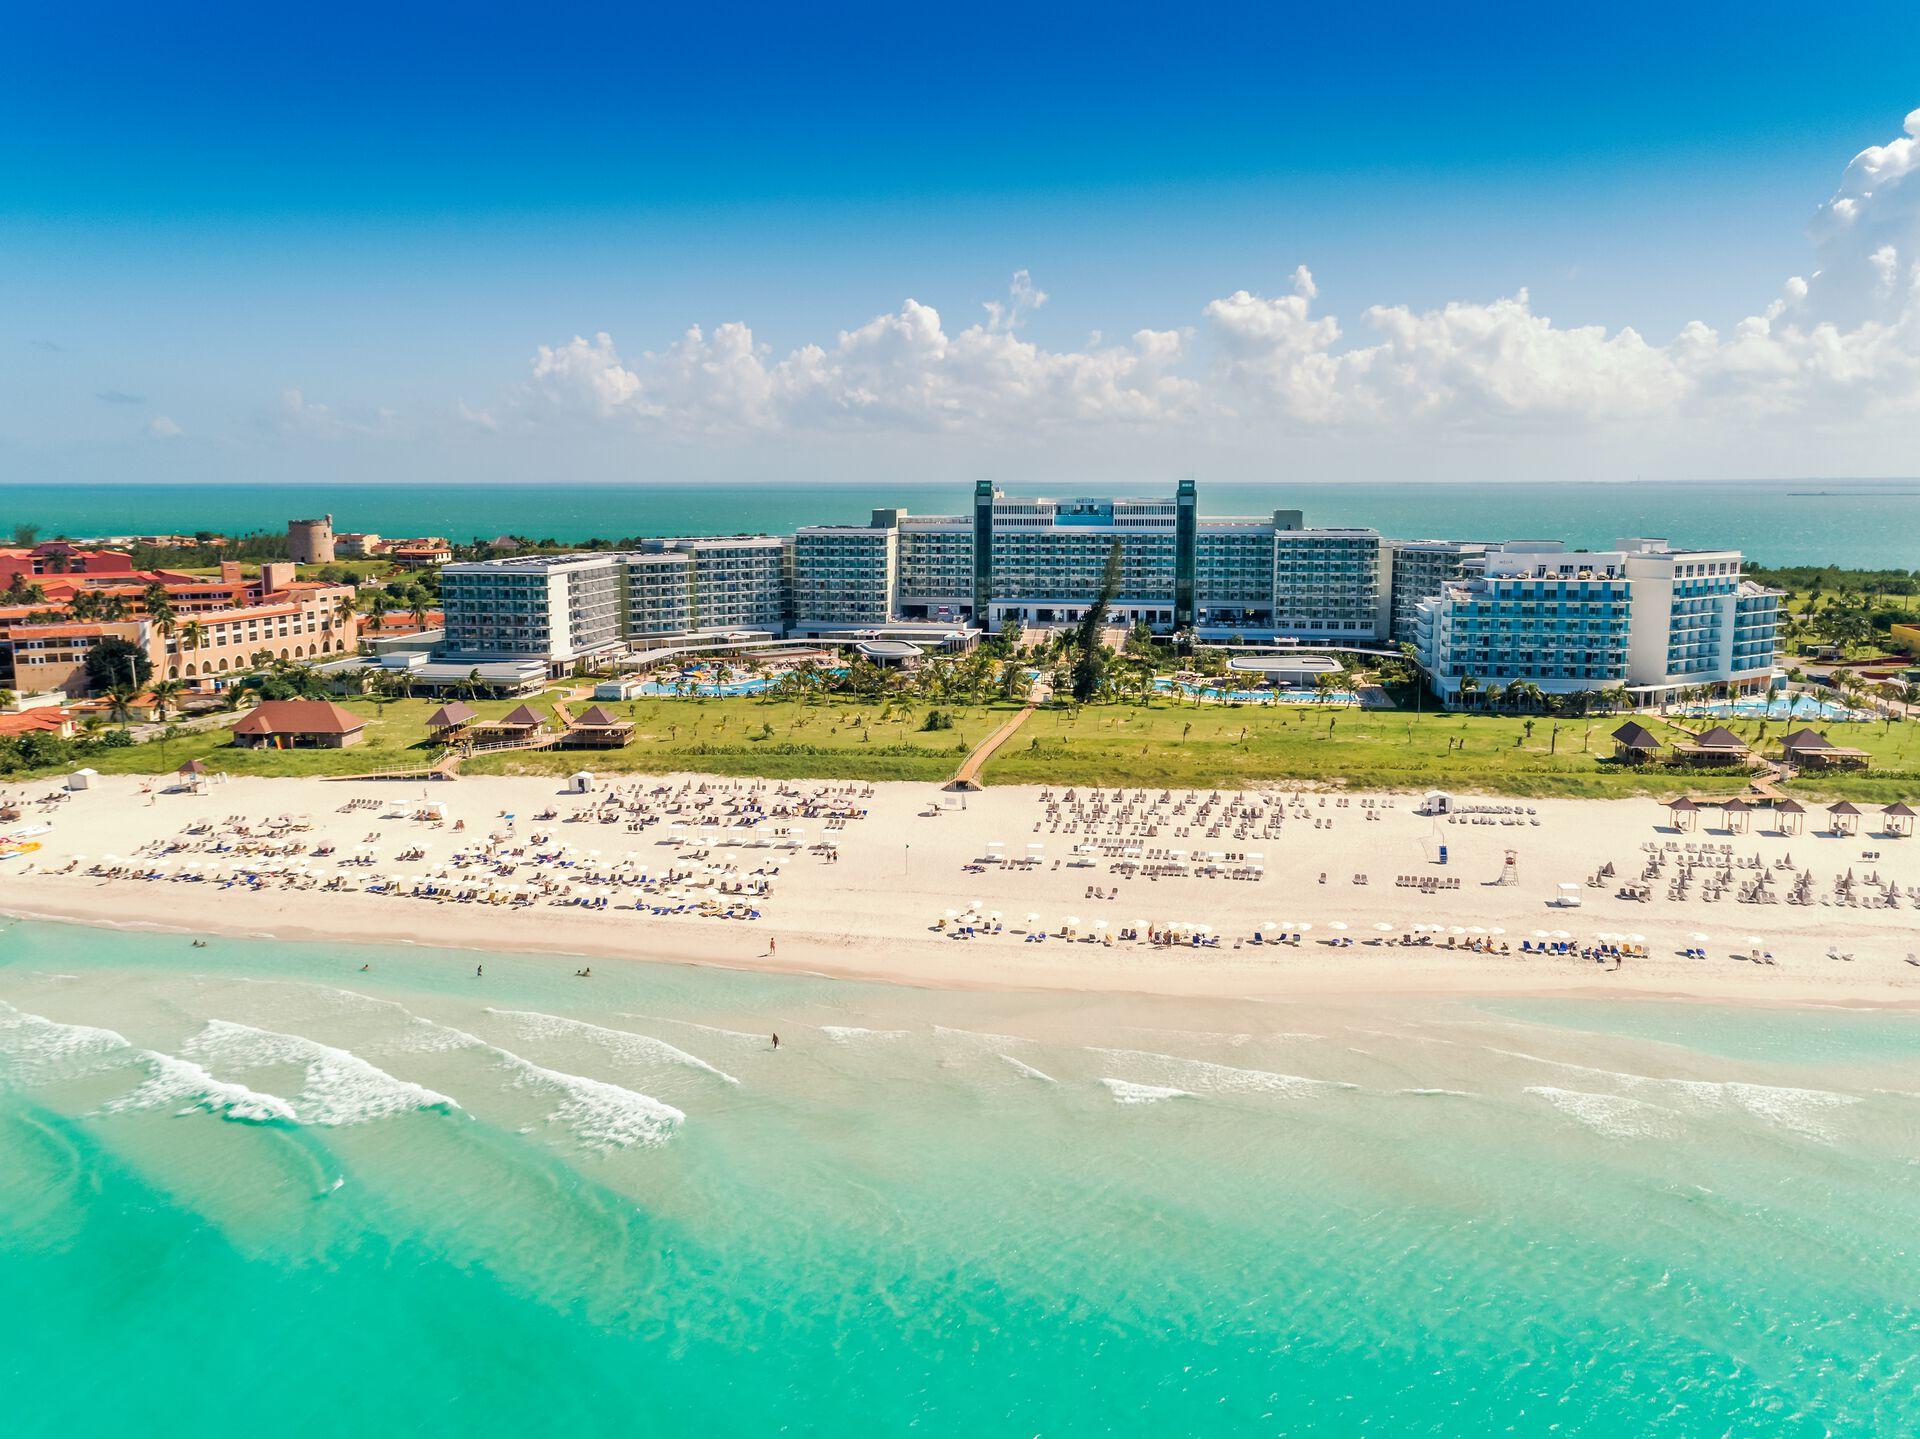 Hotel Melia Internacional Varadero 5 Varadero Cuba Avec Voyages Leclerc Fti Ref 605416 Mars 2021 Avril 2021 Mai 2021